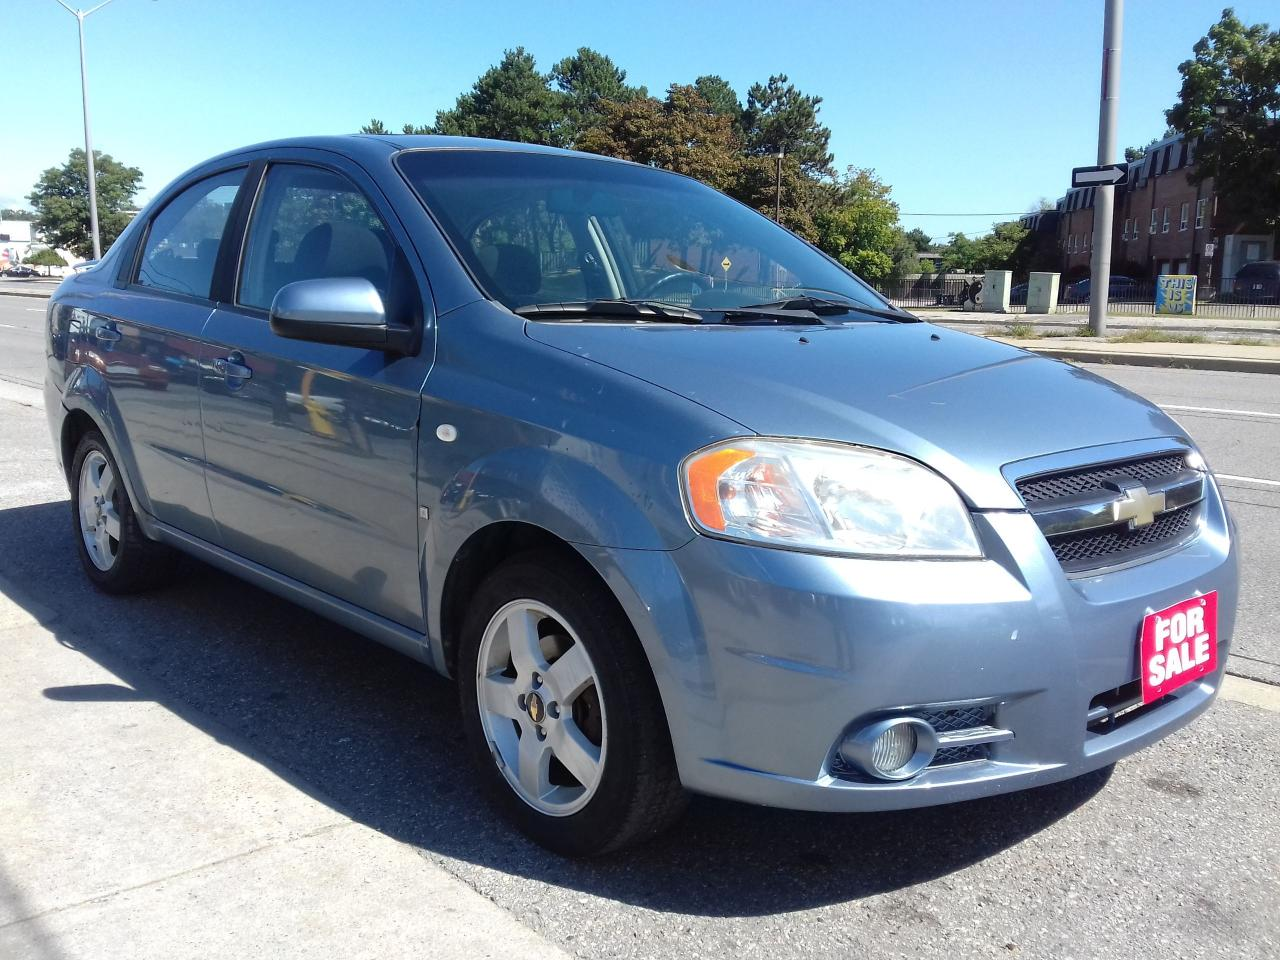 2008 Chevrolet Aveo LT - $2600 CERTIFIED